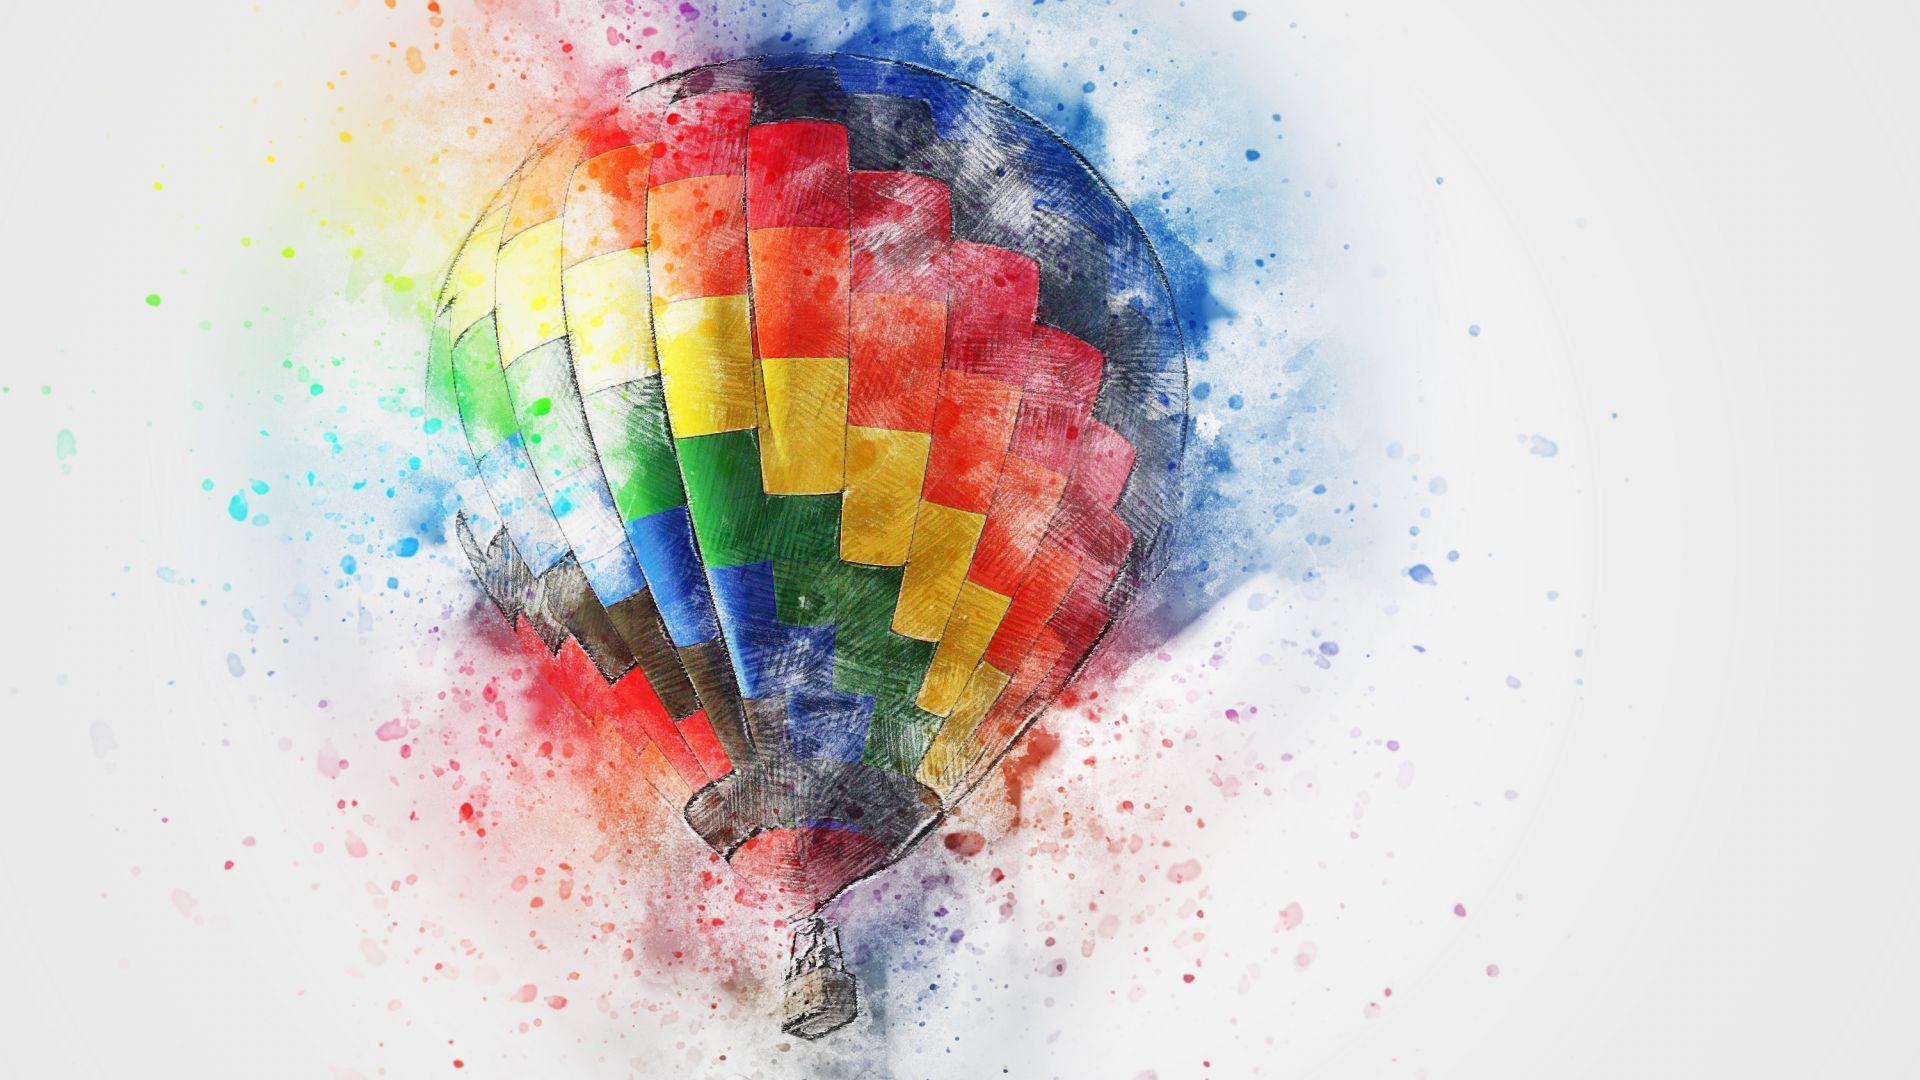 desktop wallpaper hot air balloon colorful art hd image